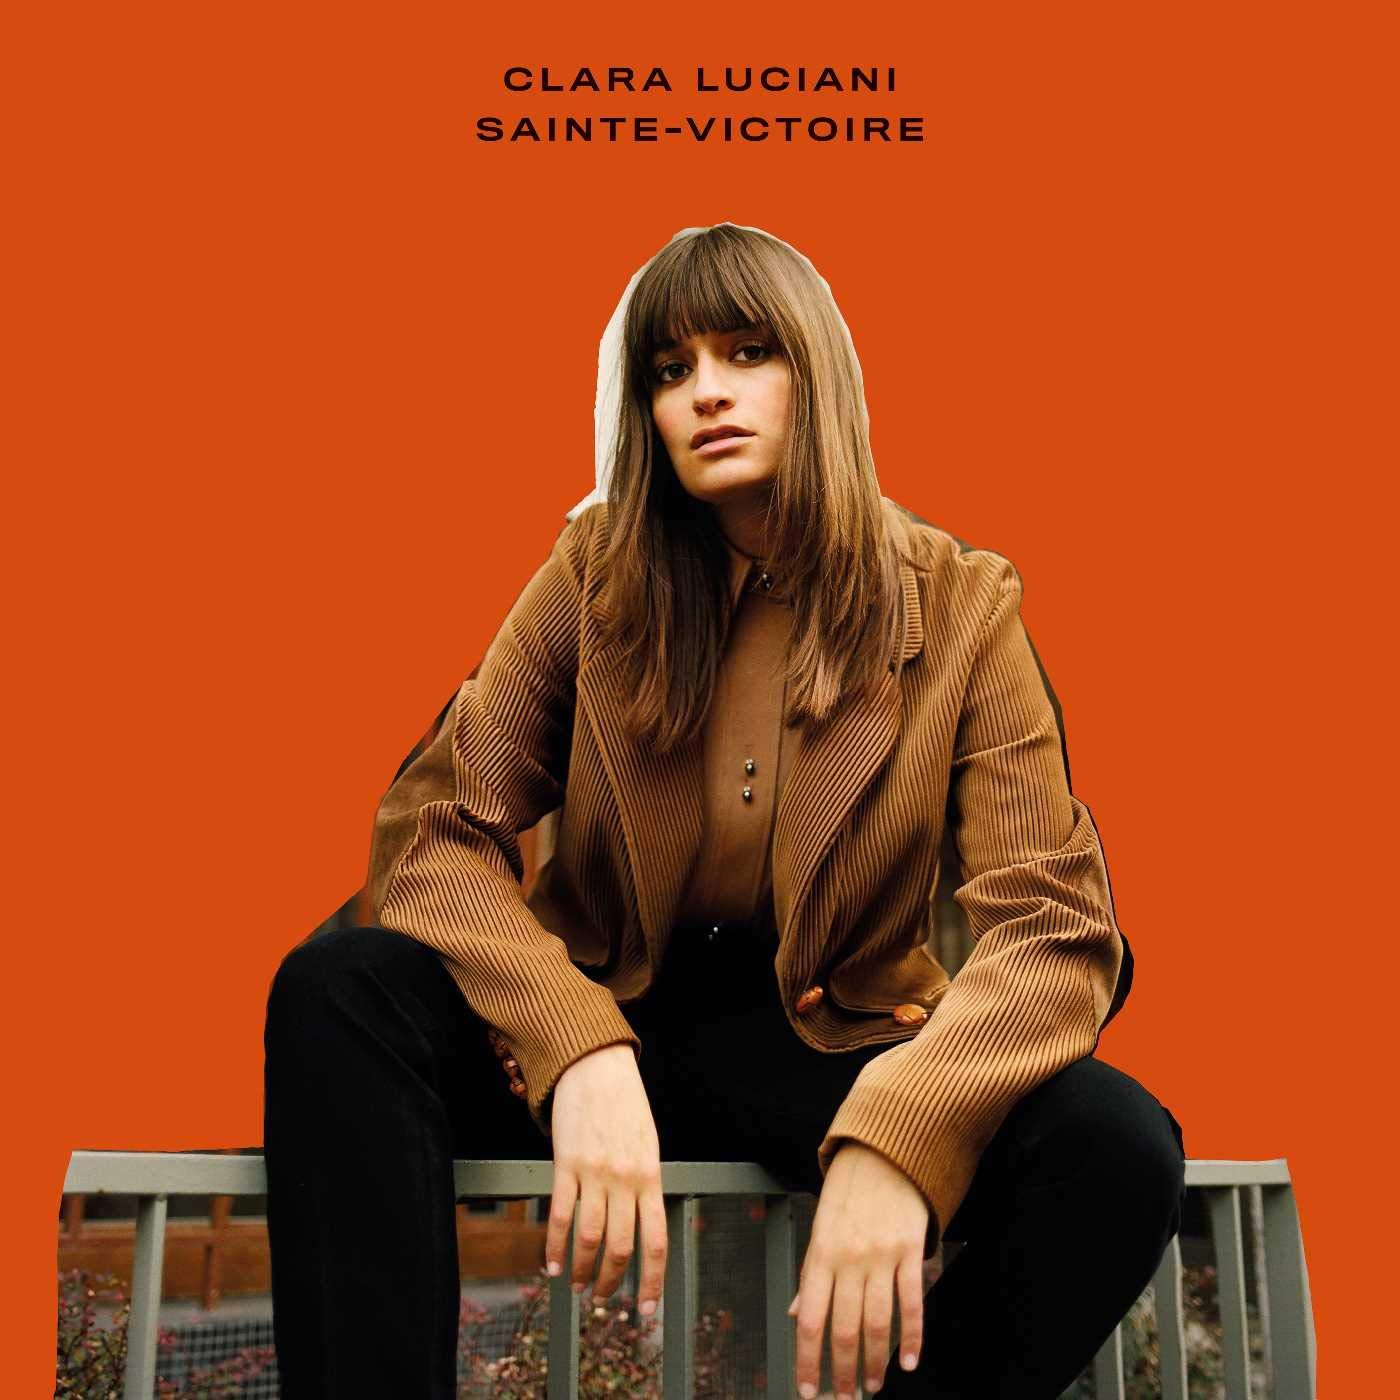 Vinyle Clara Luciani - Sainte Victoire